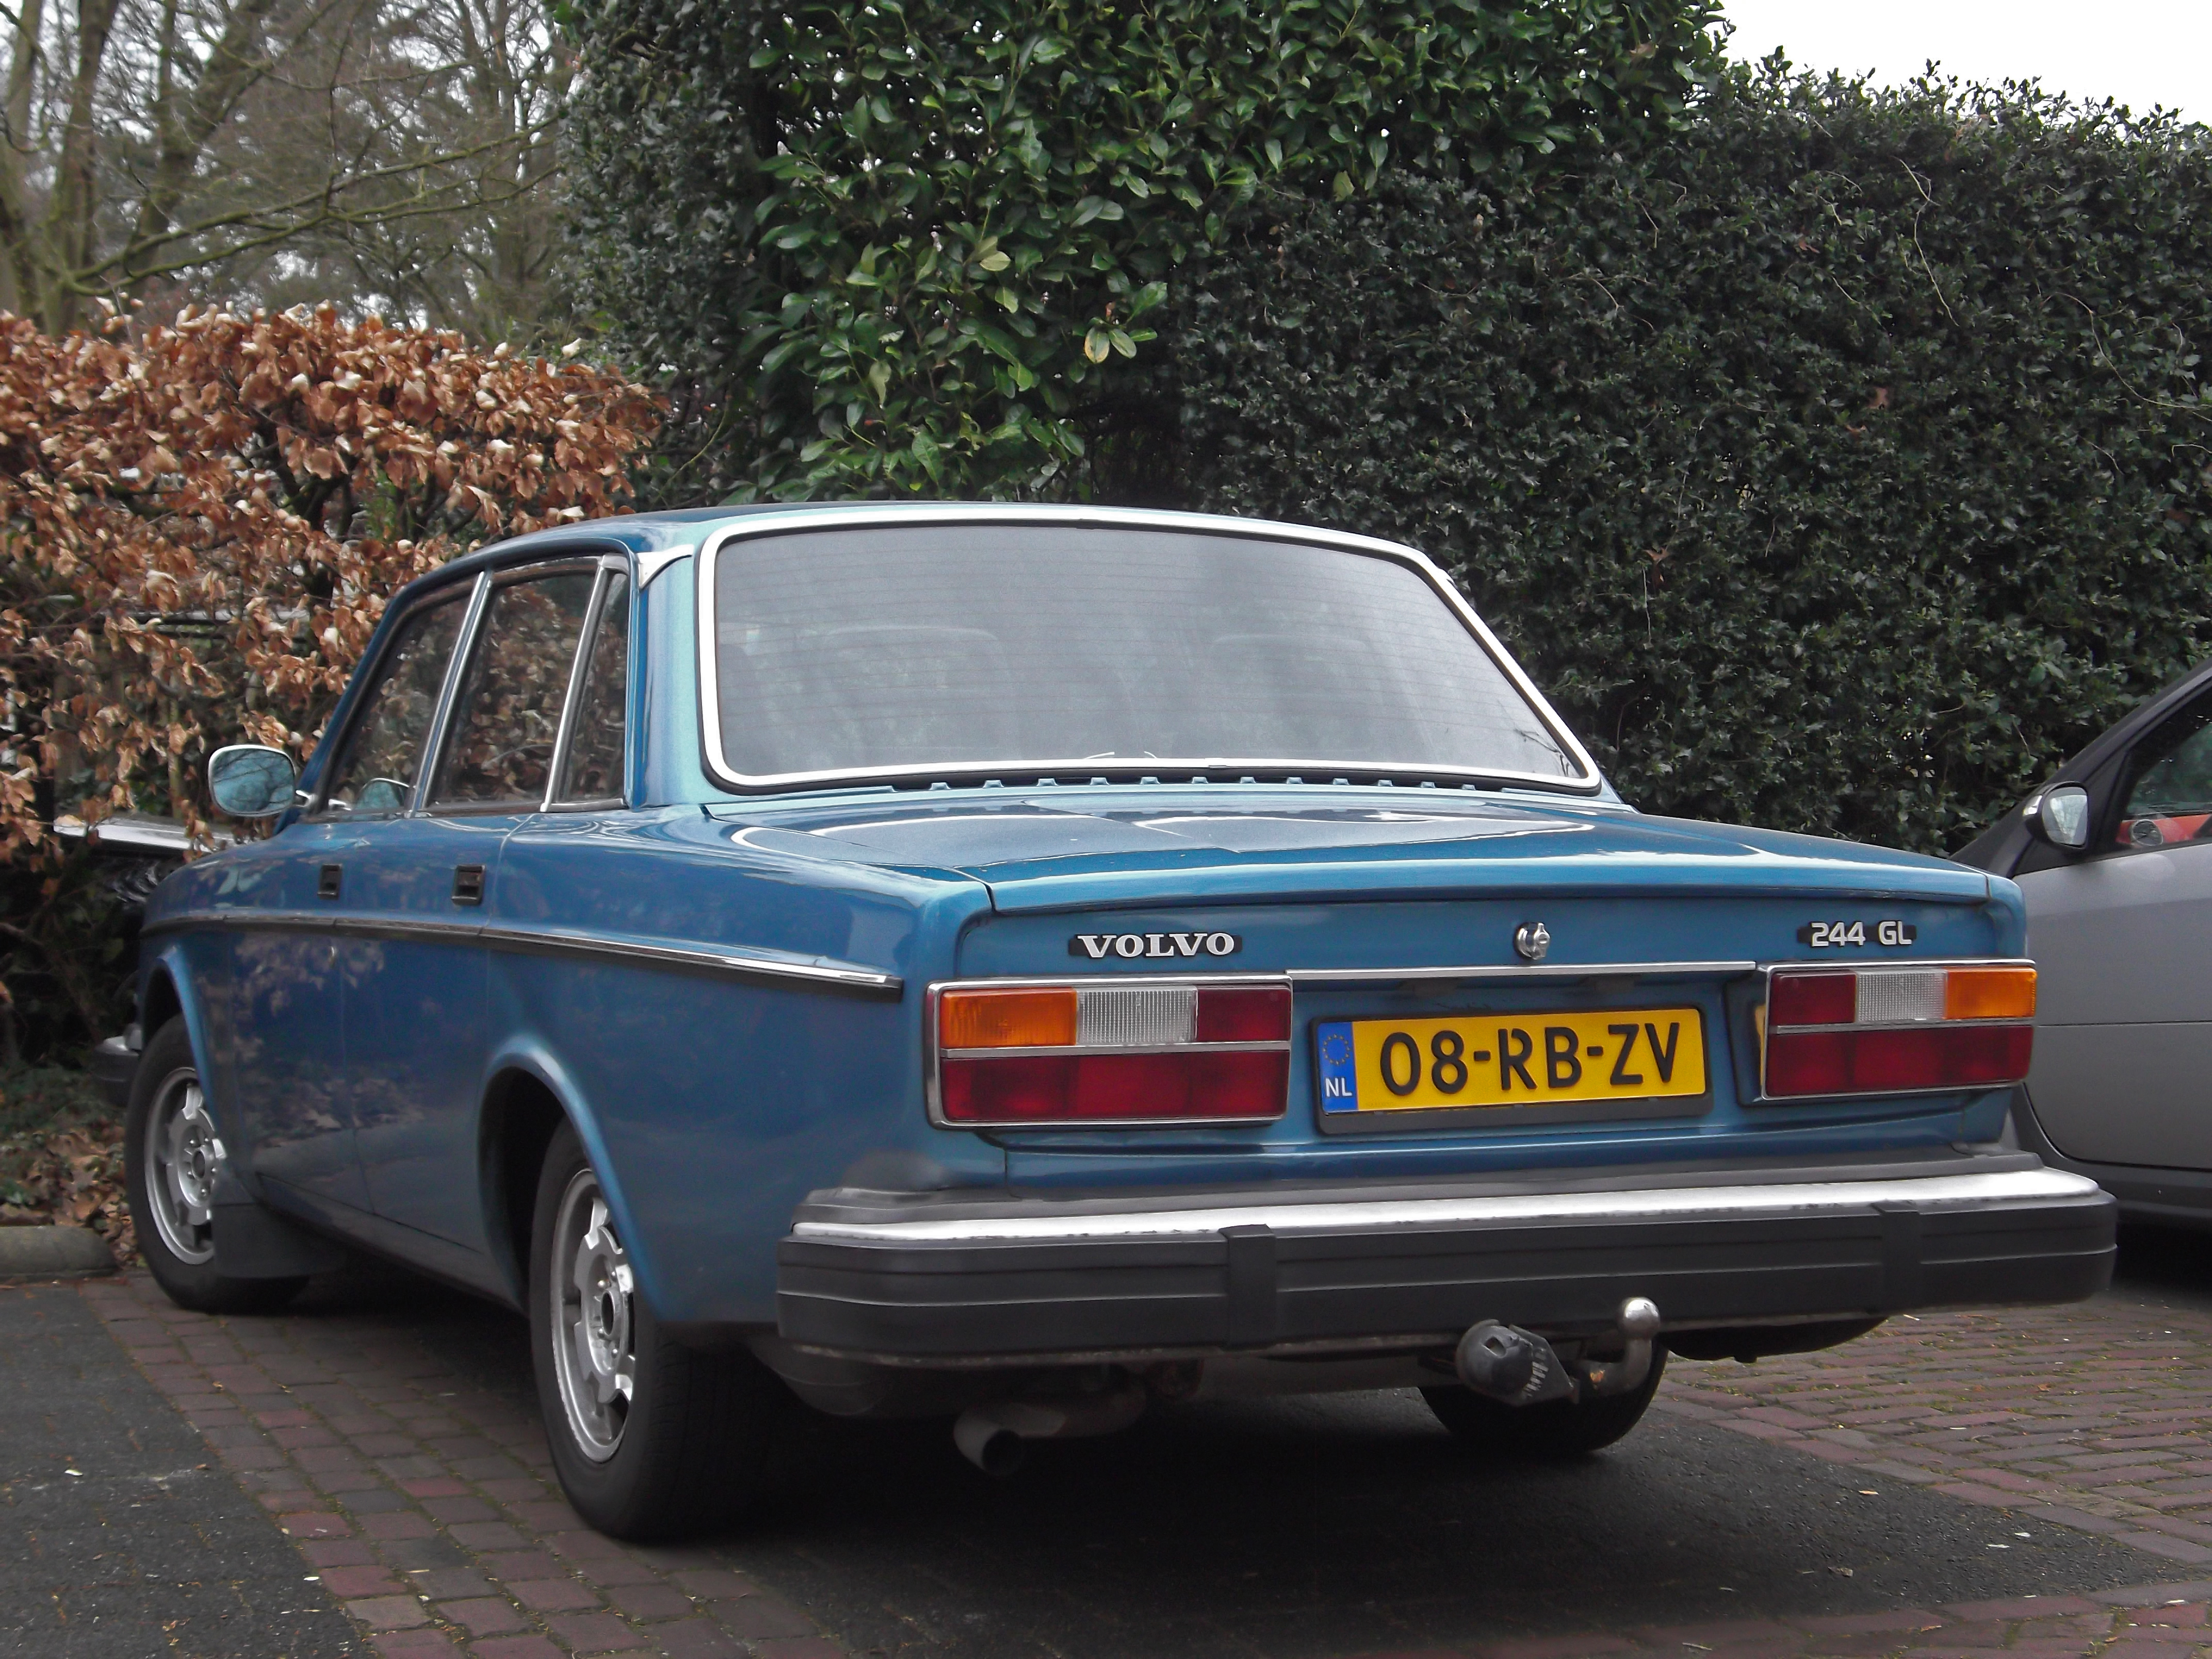 File:Volvo 244 GL (13219860853).jpg